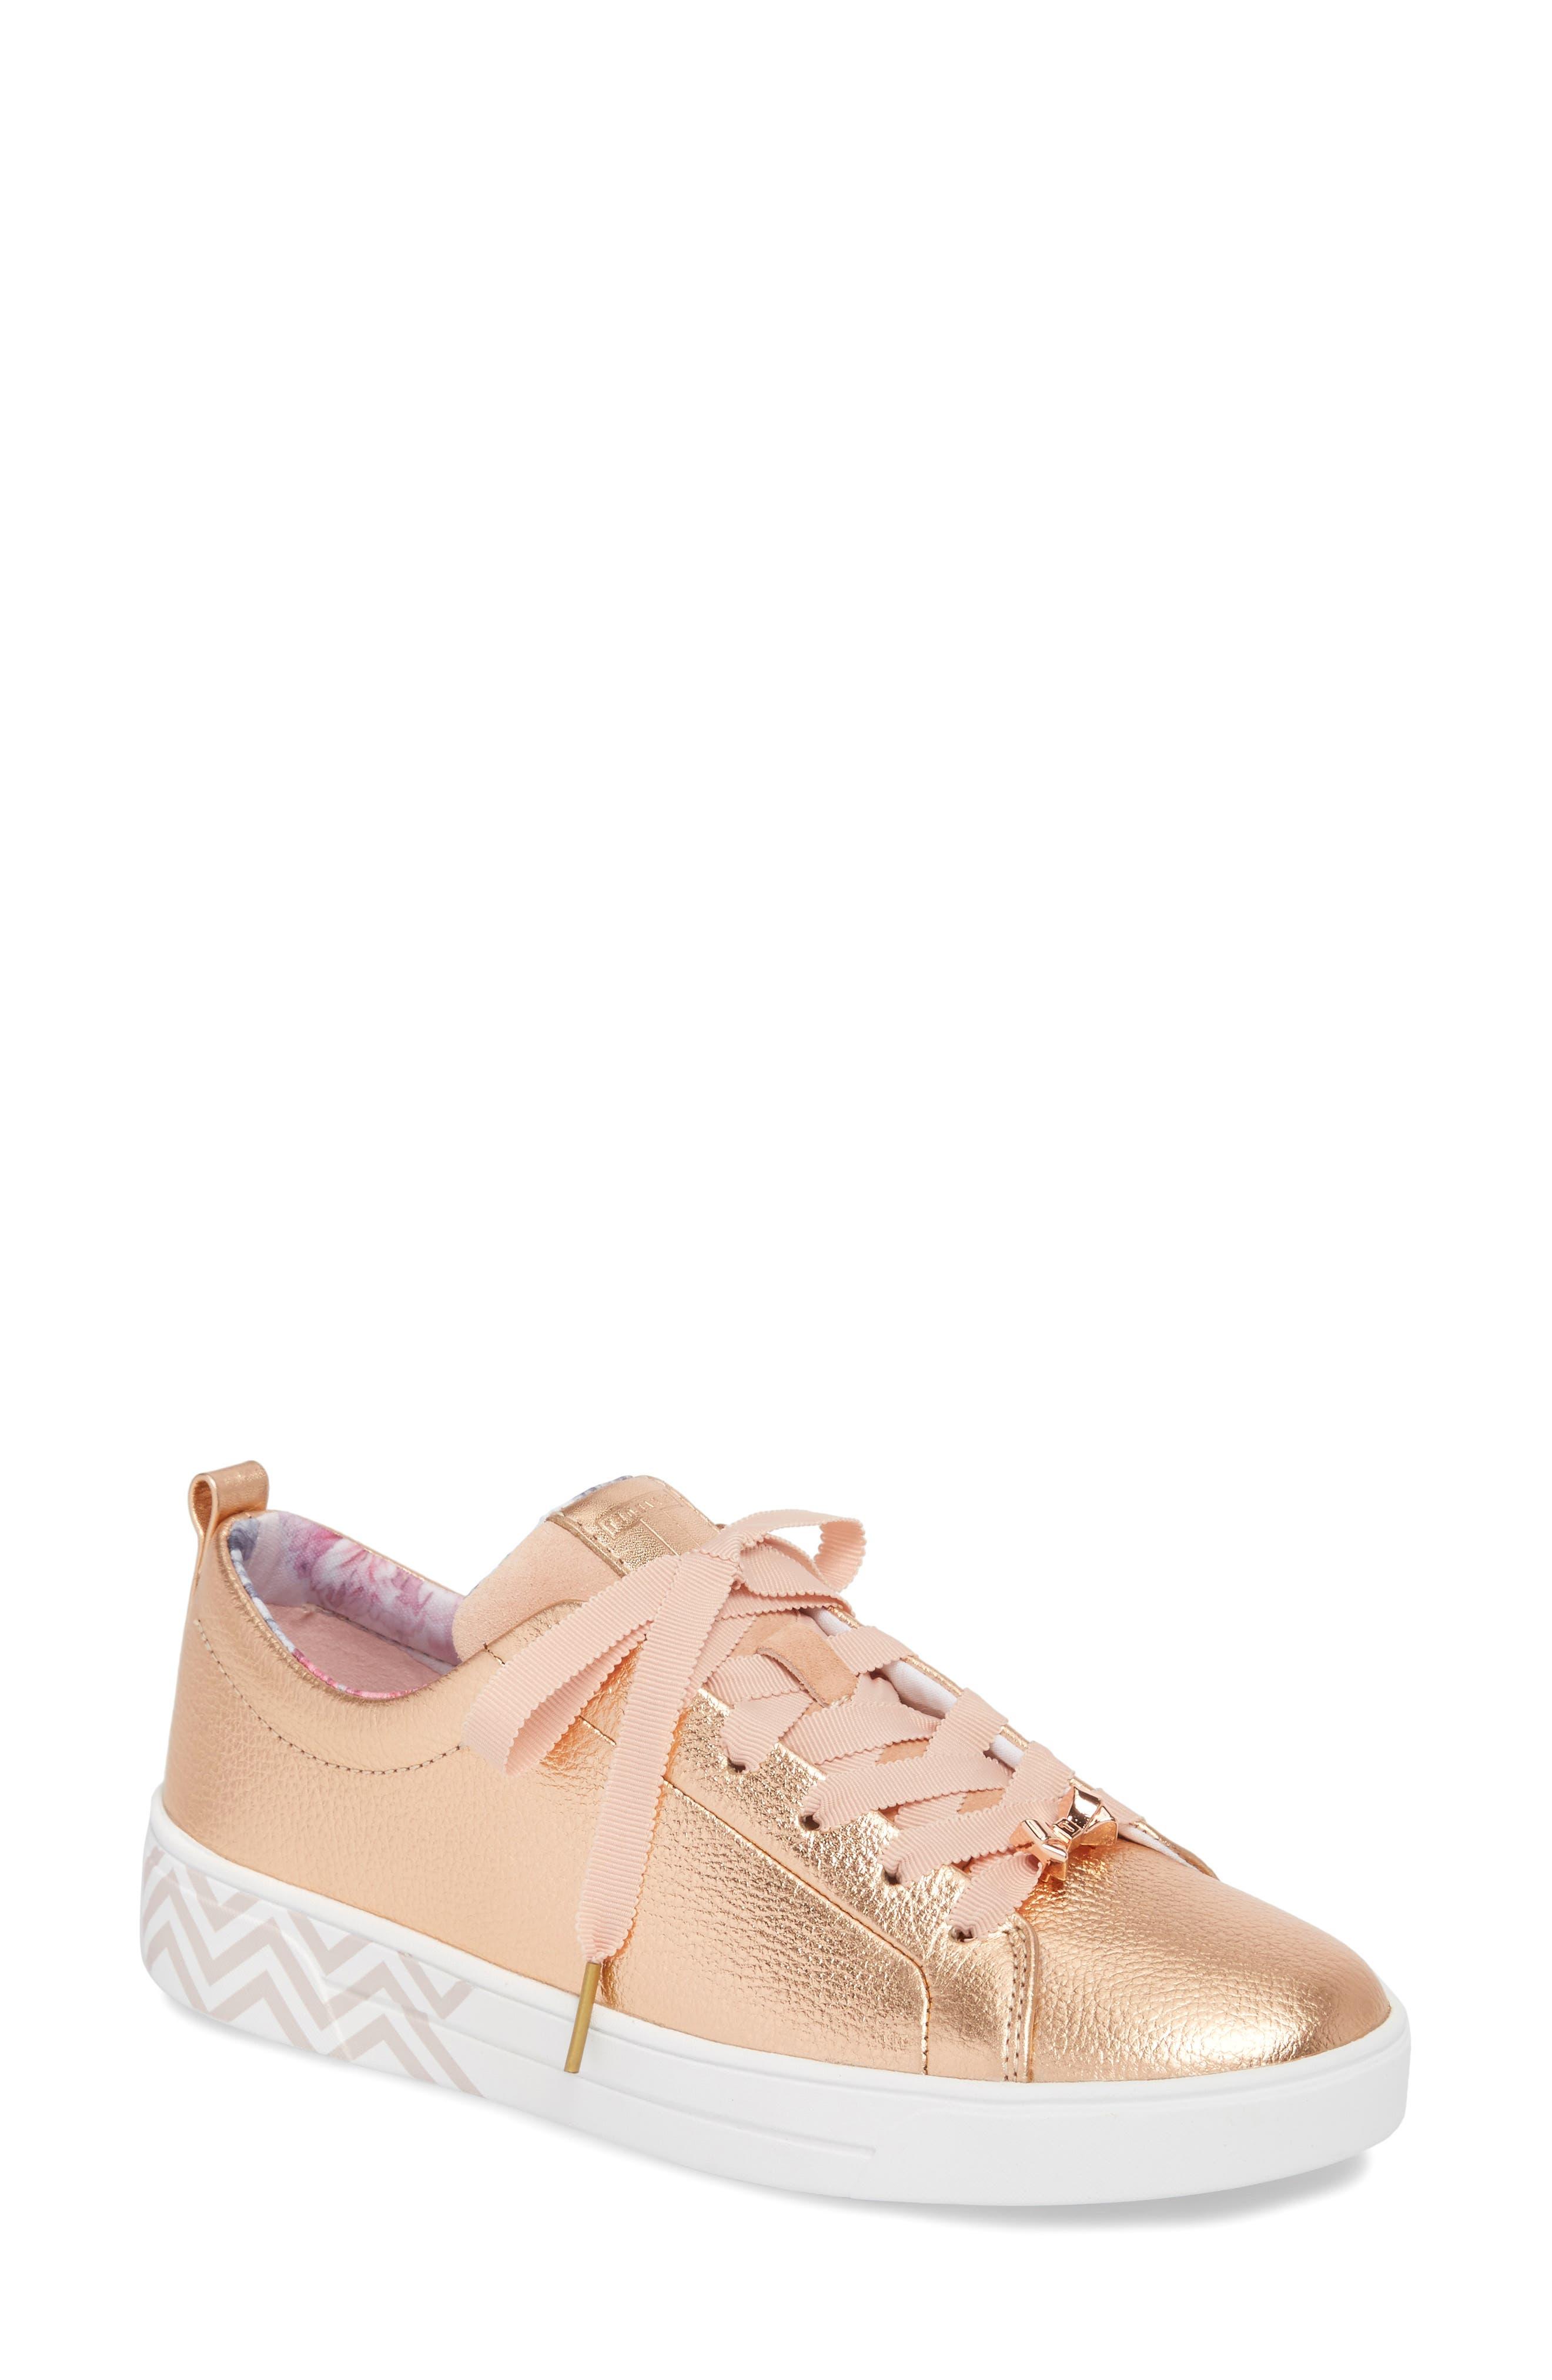 Kelleip Sneaker,                             Main thumbnail 1, color,                             ROSE GOLD/ PALACE GARDENS